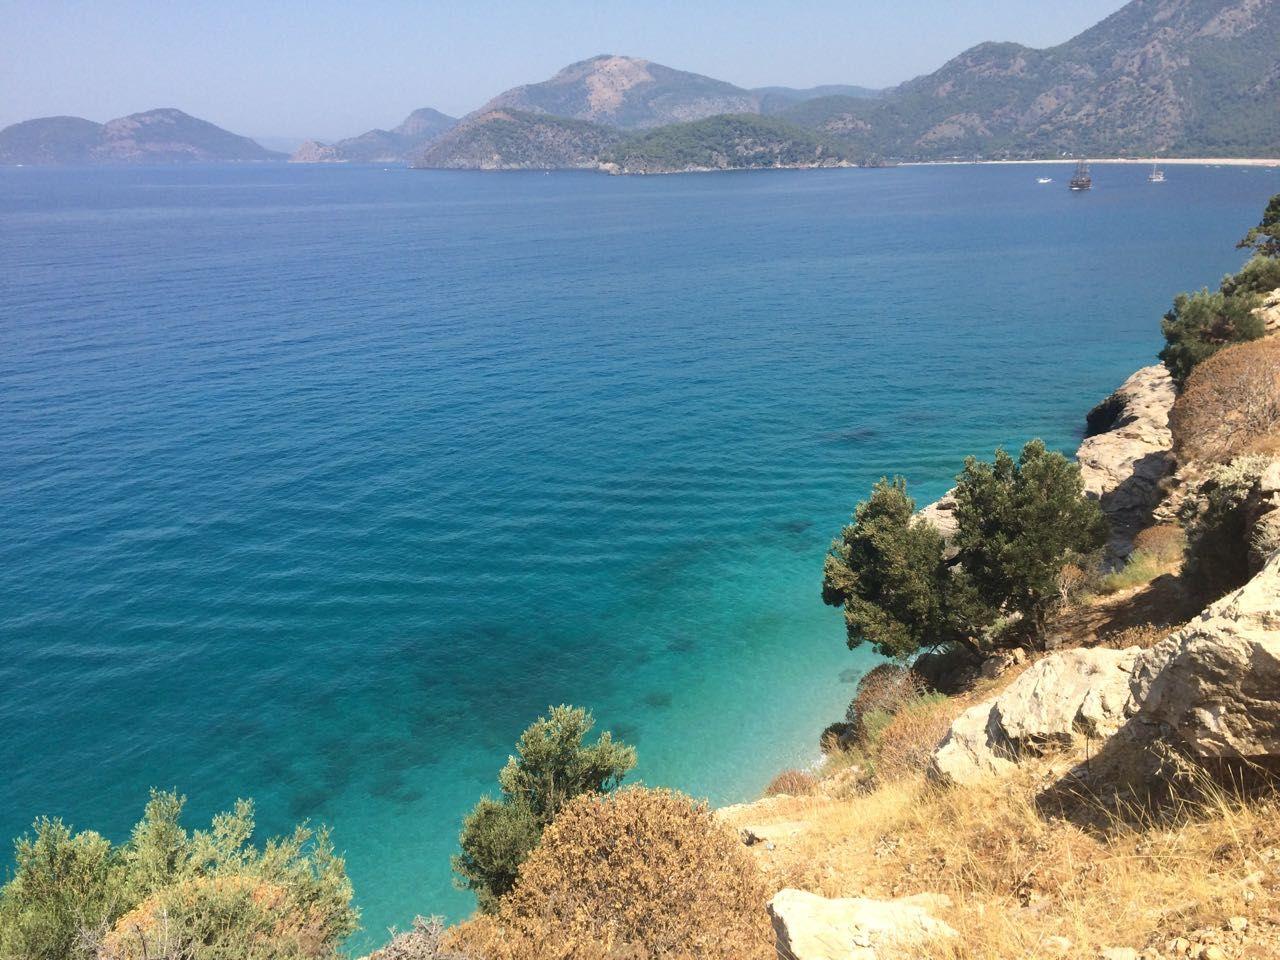 likiyskaya tropa, vid na more